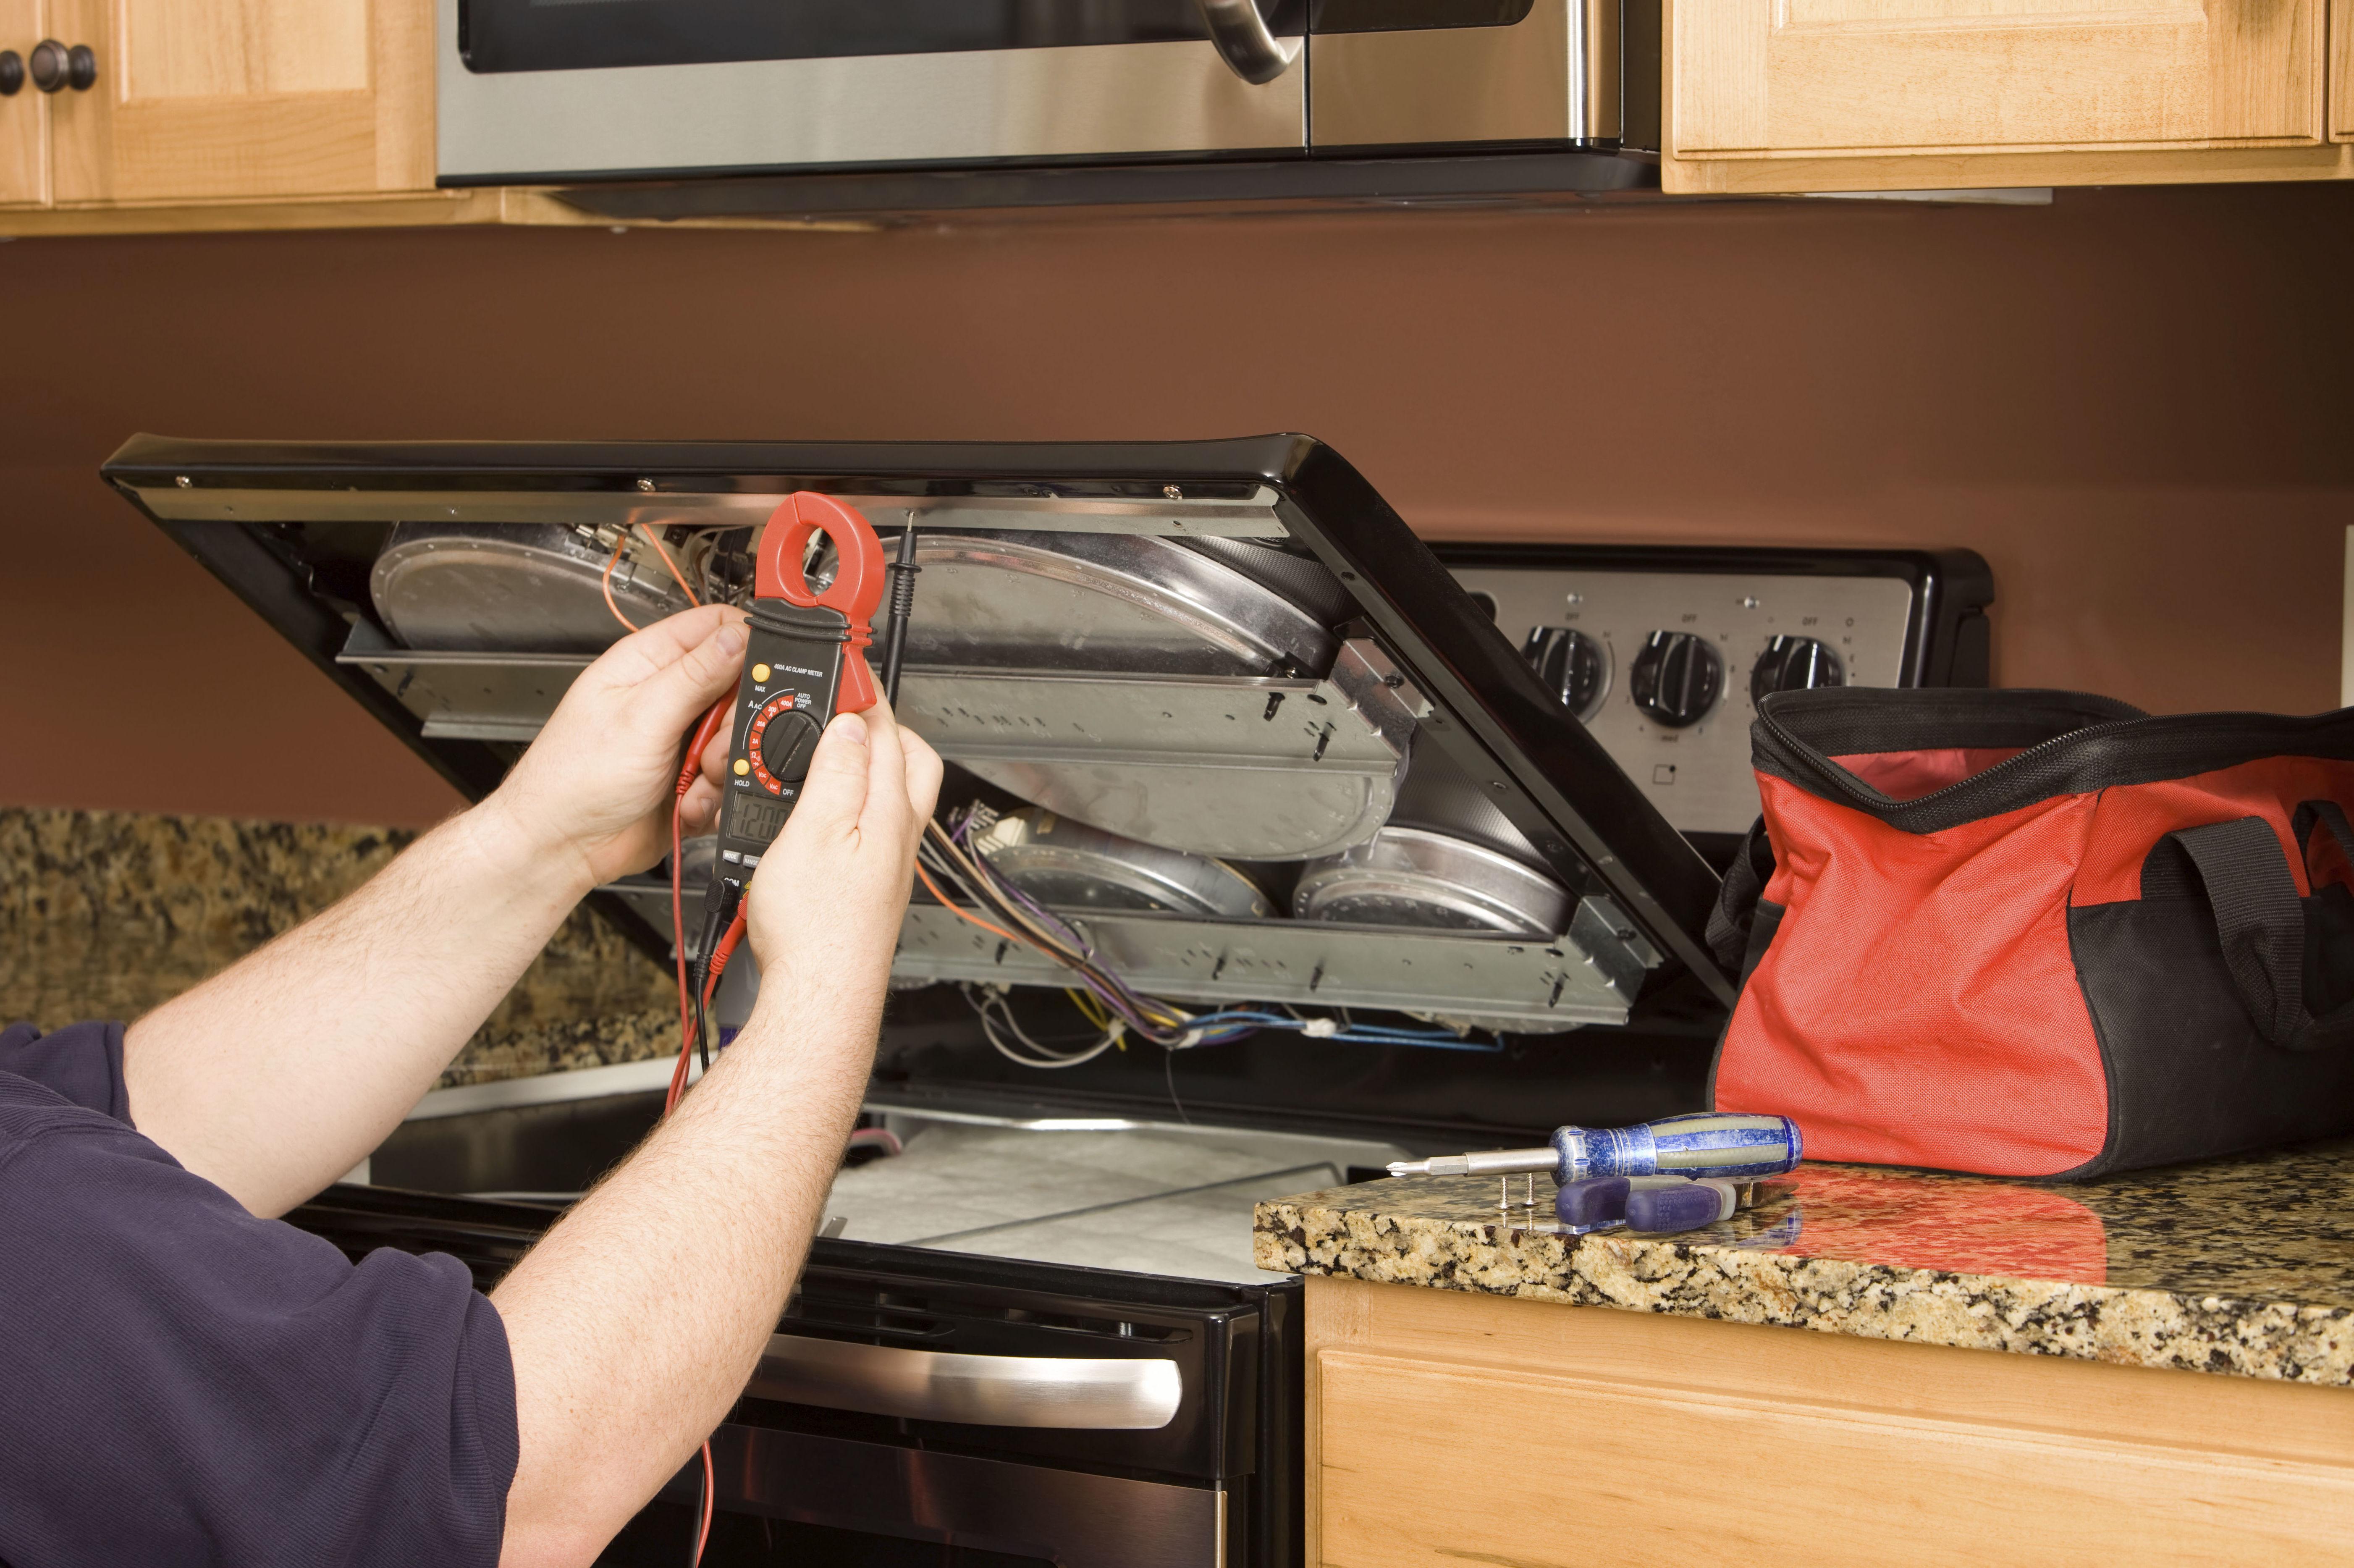 Reparación de electrodomésticos en Zamora